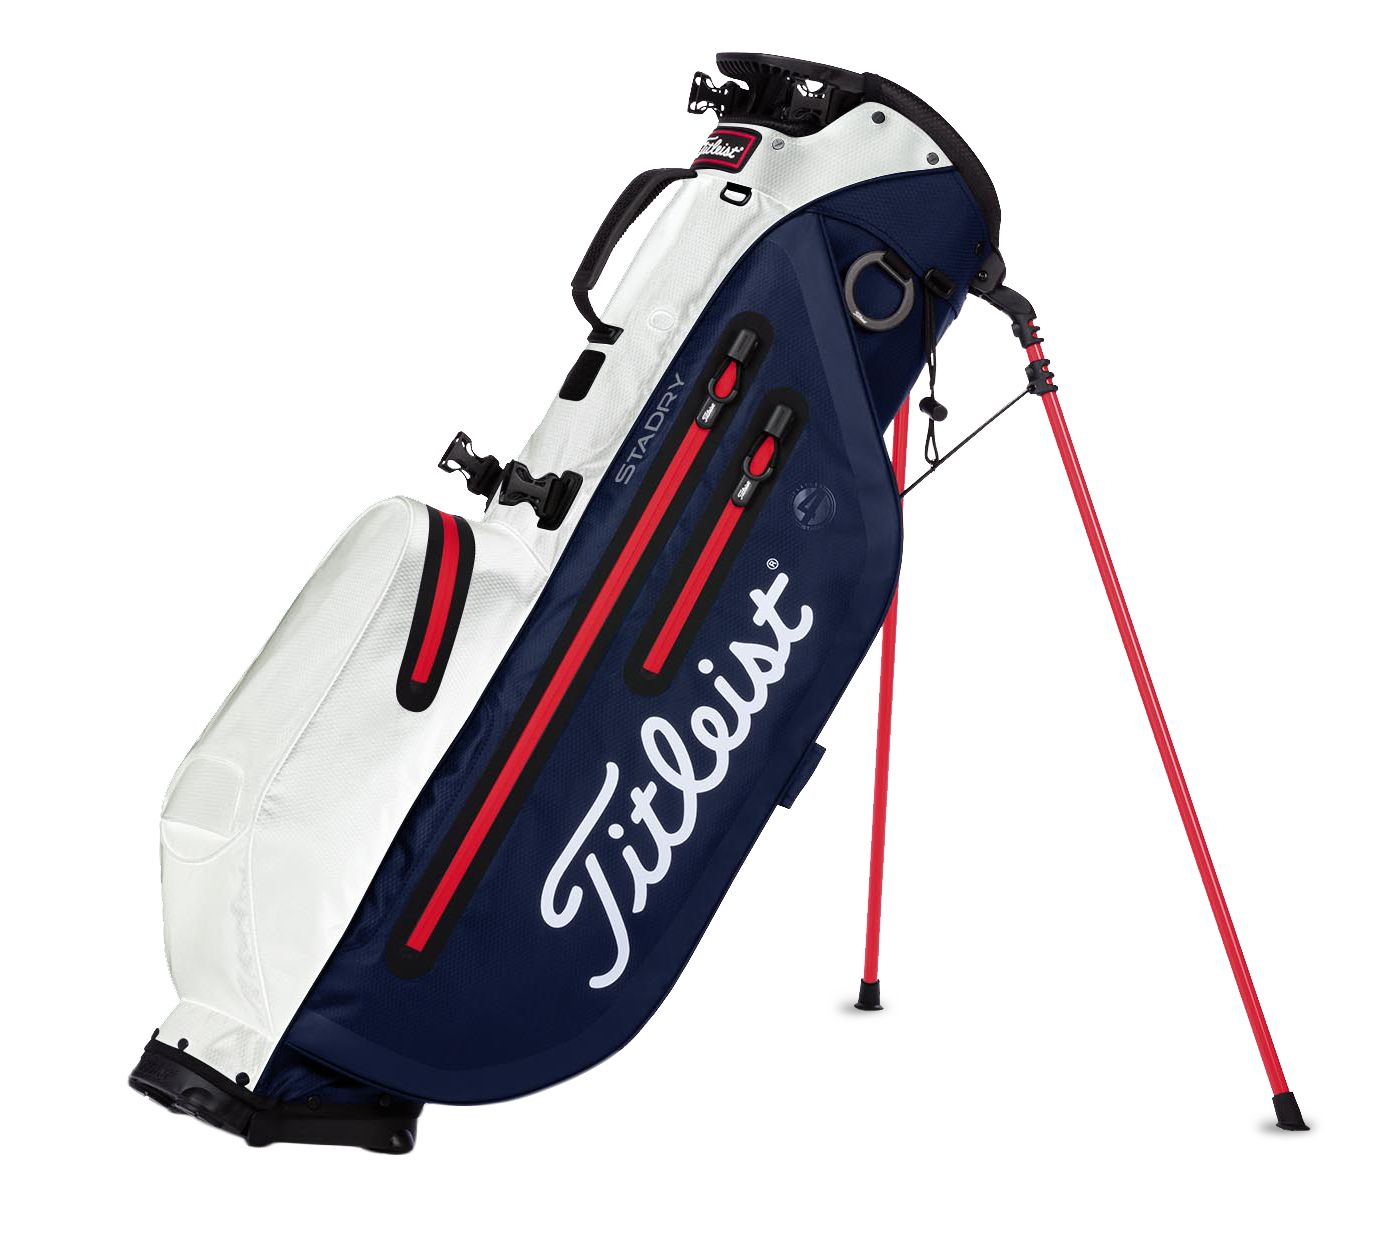 Titleist 2020 Players 4 StaDry Stand Golf Bag